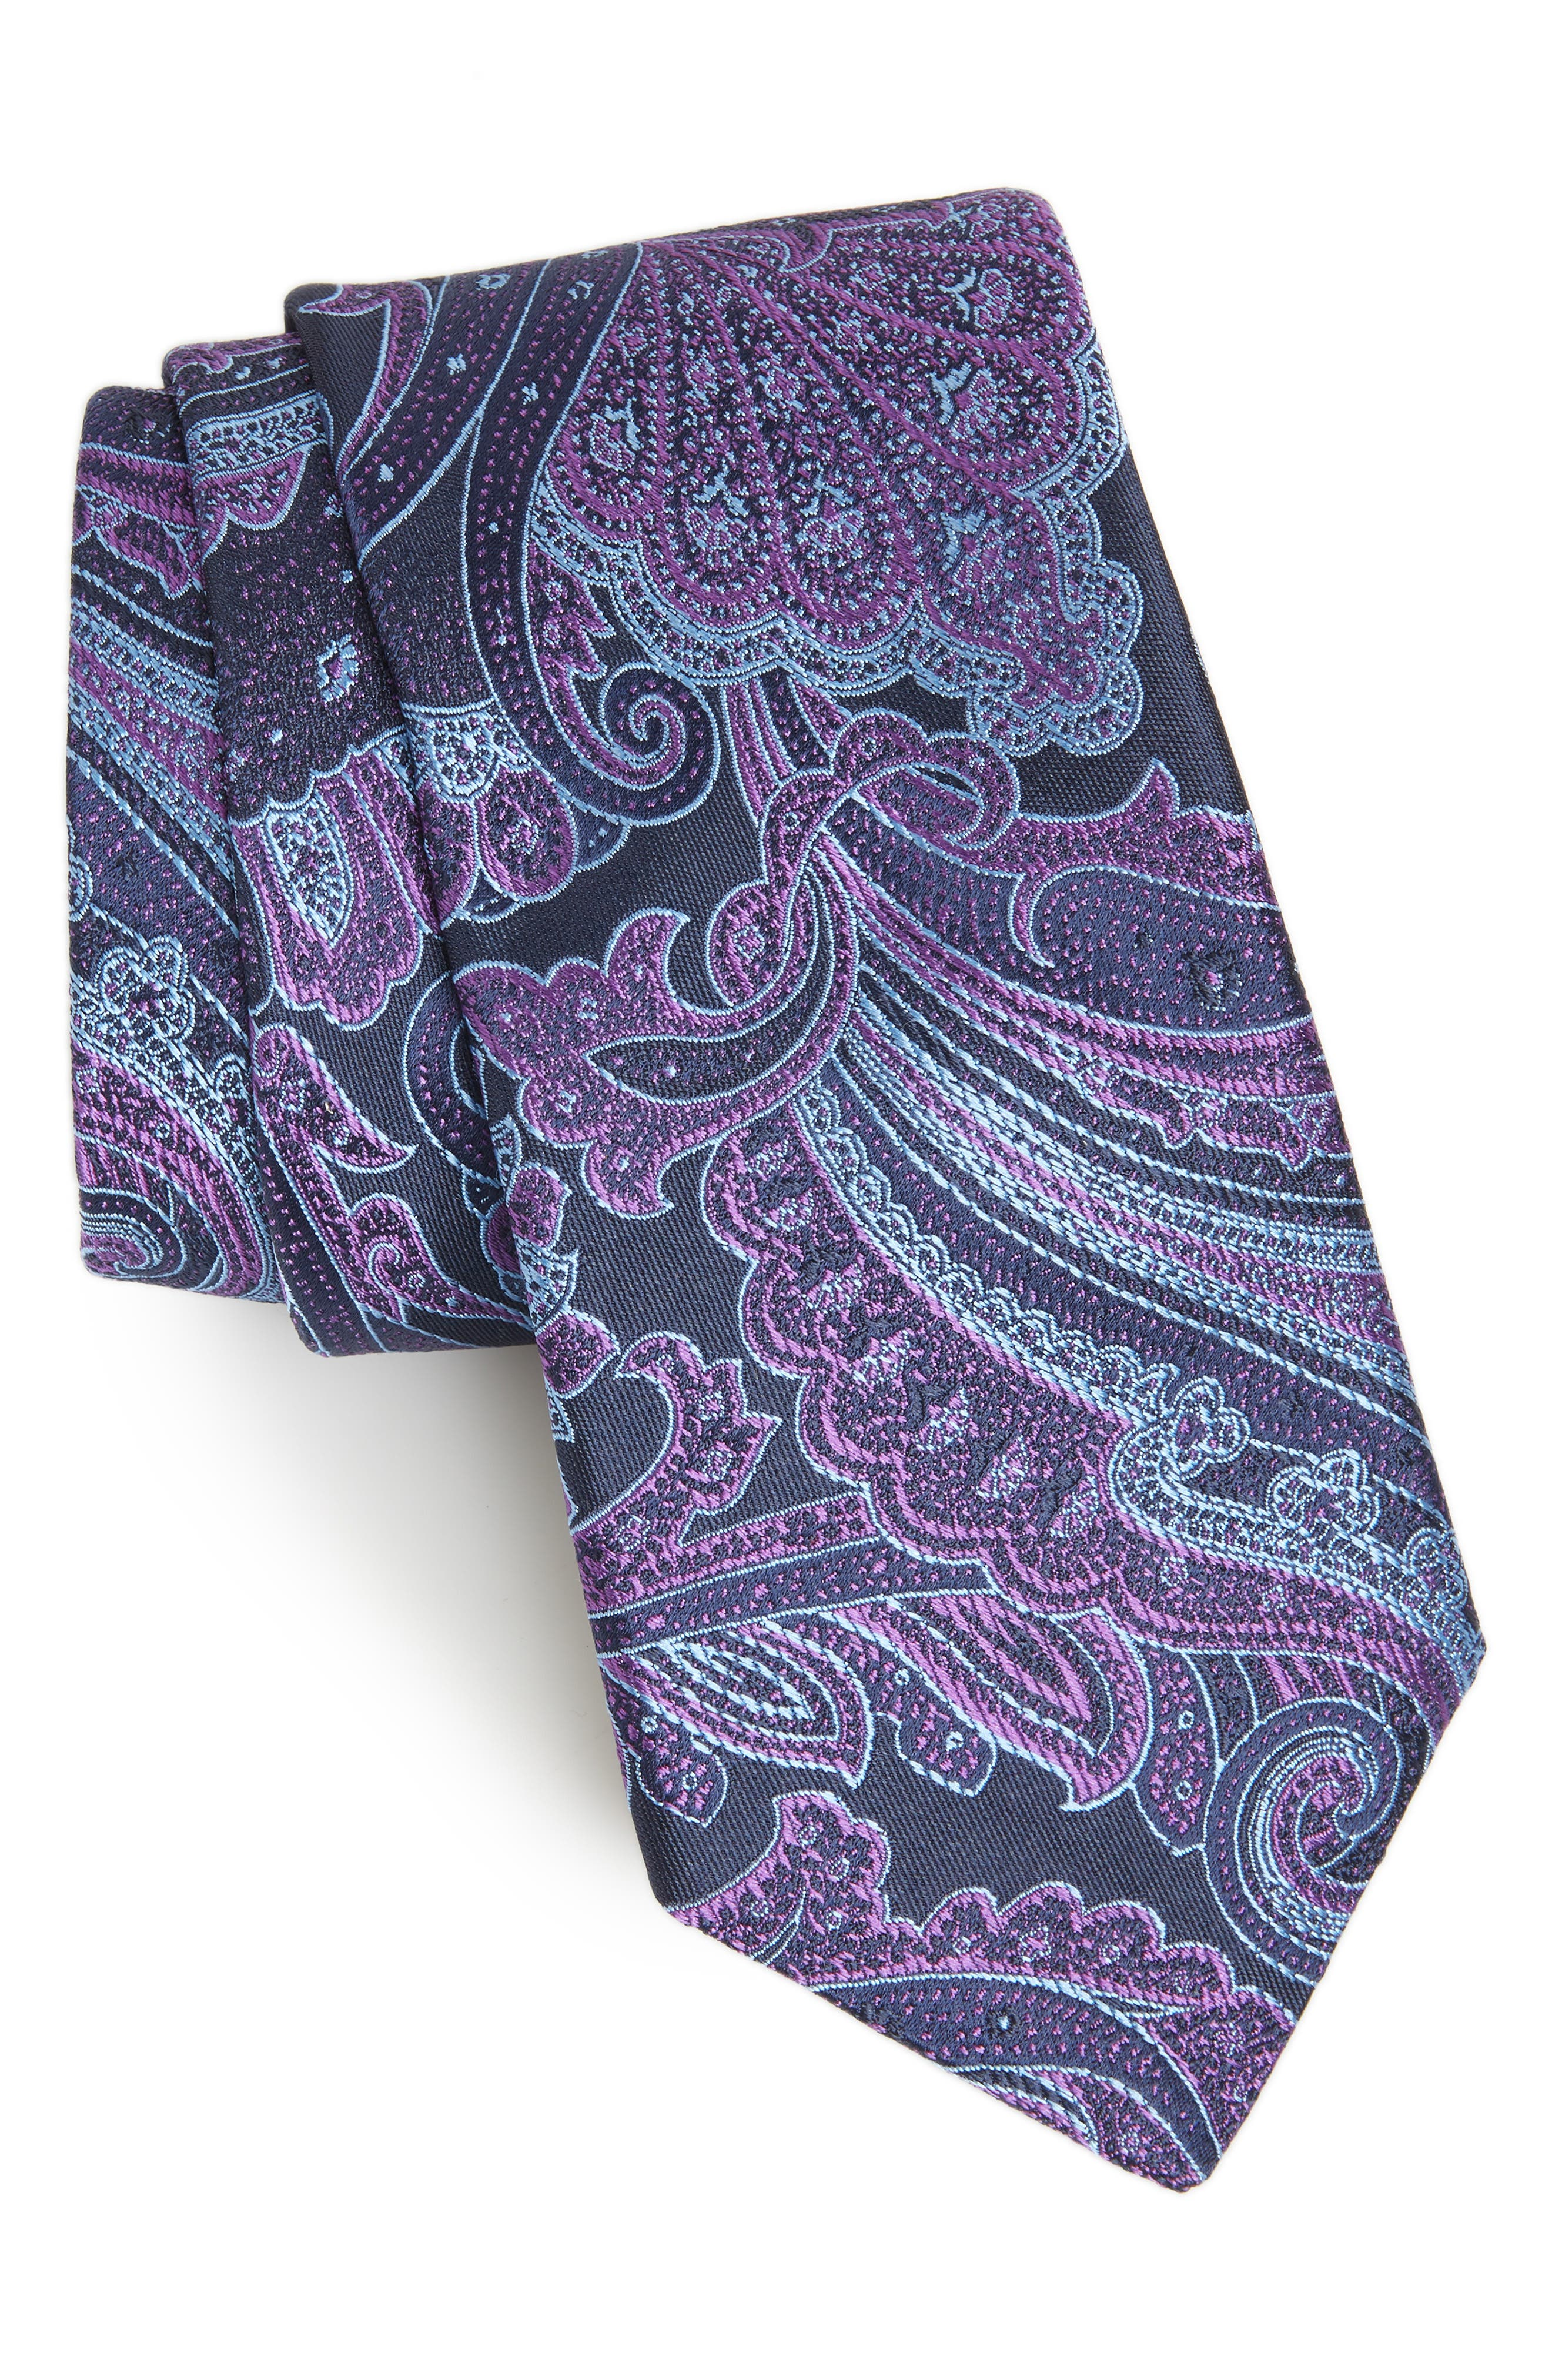 TED BAKER LONDON,                             Paisley Silk Tie,                             Main thumbnail 1, color,                             PURPLE